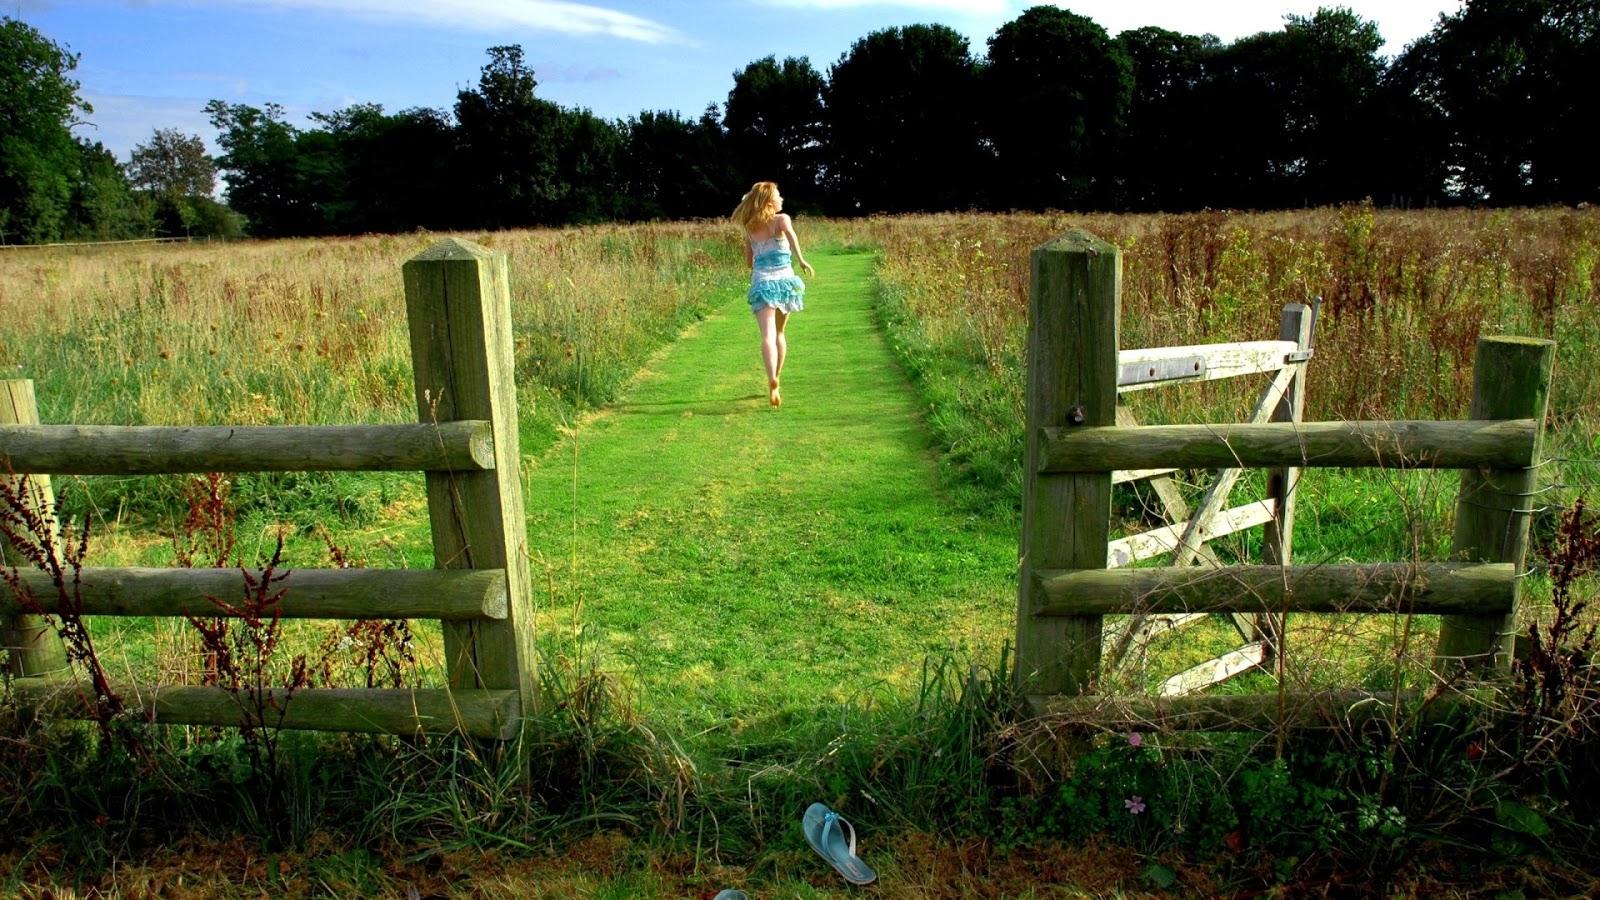 Girl Running Barefoot on Grass